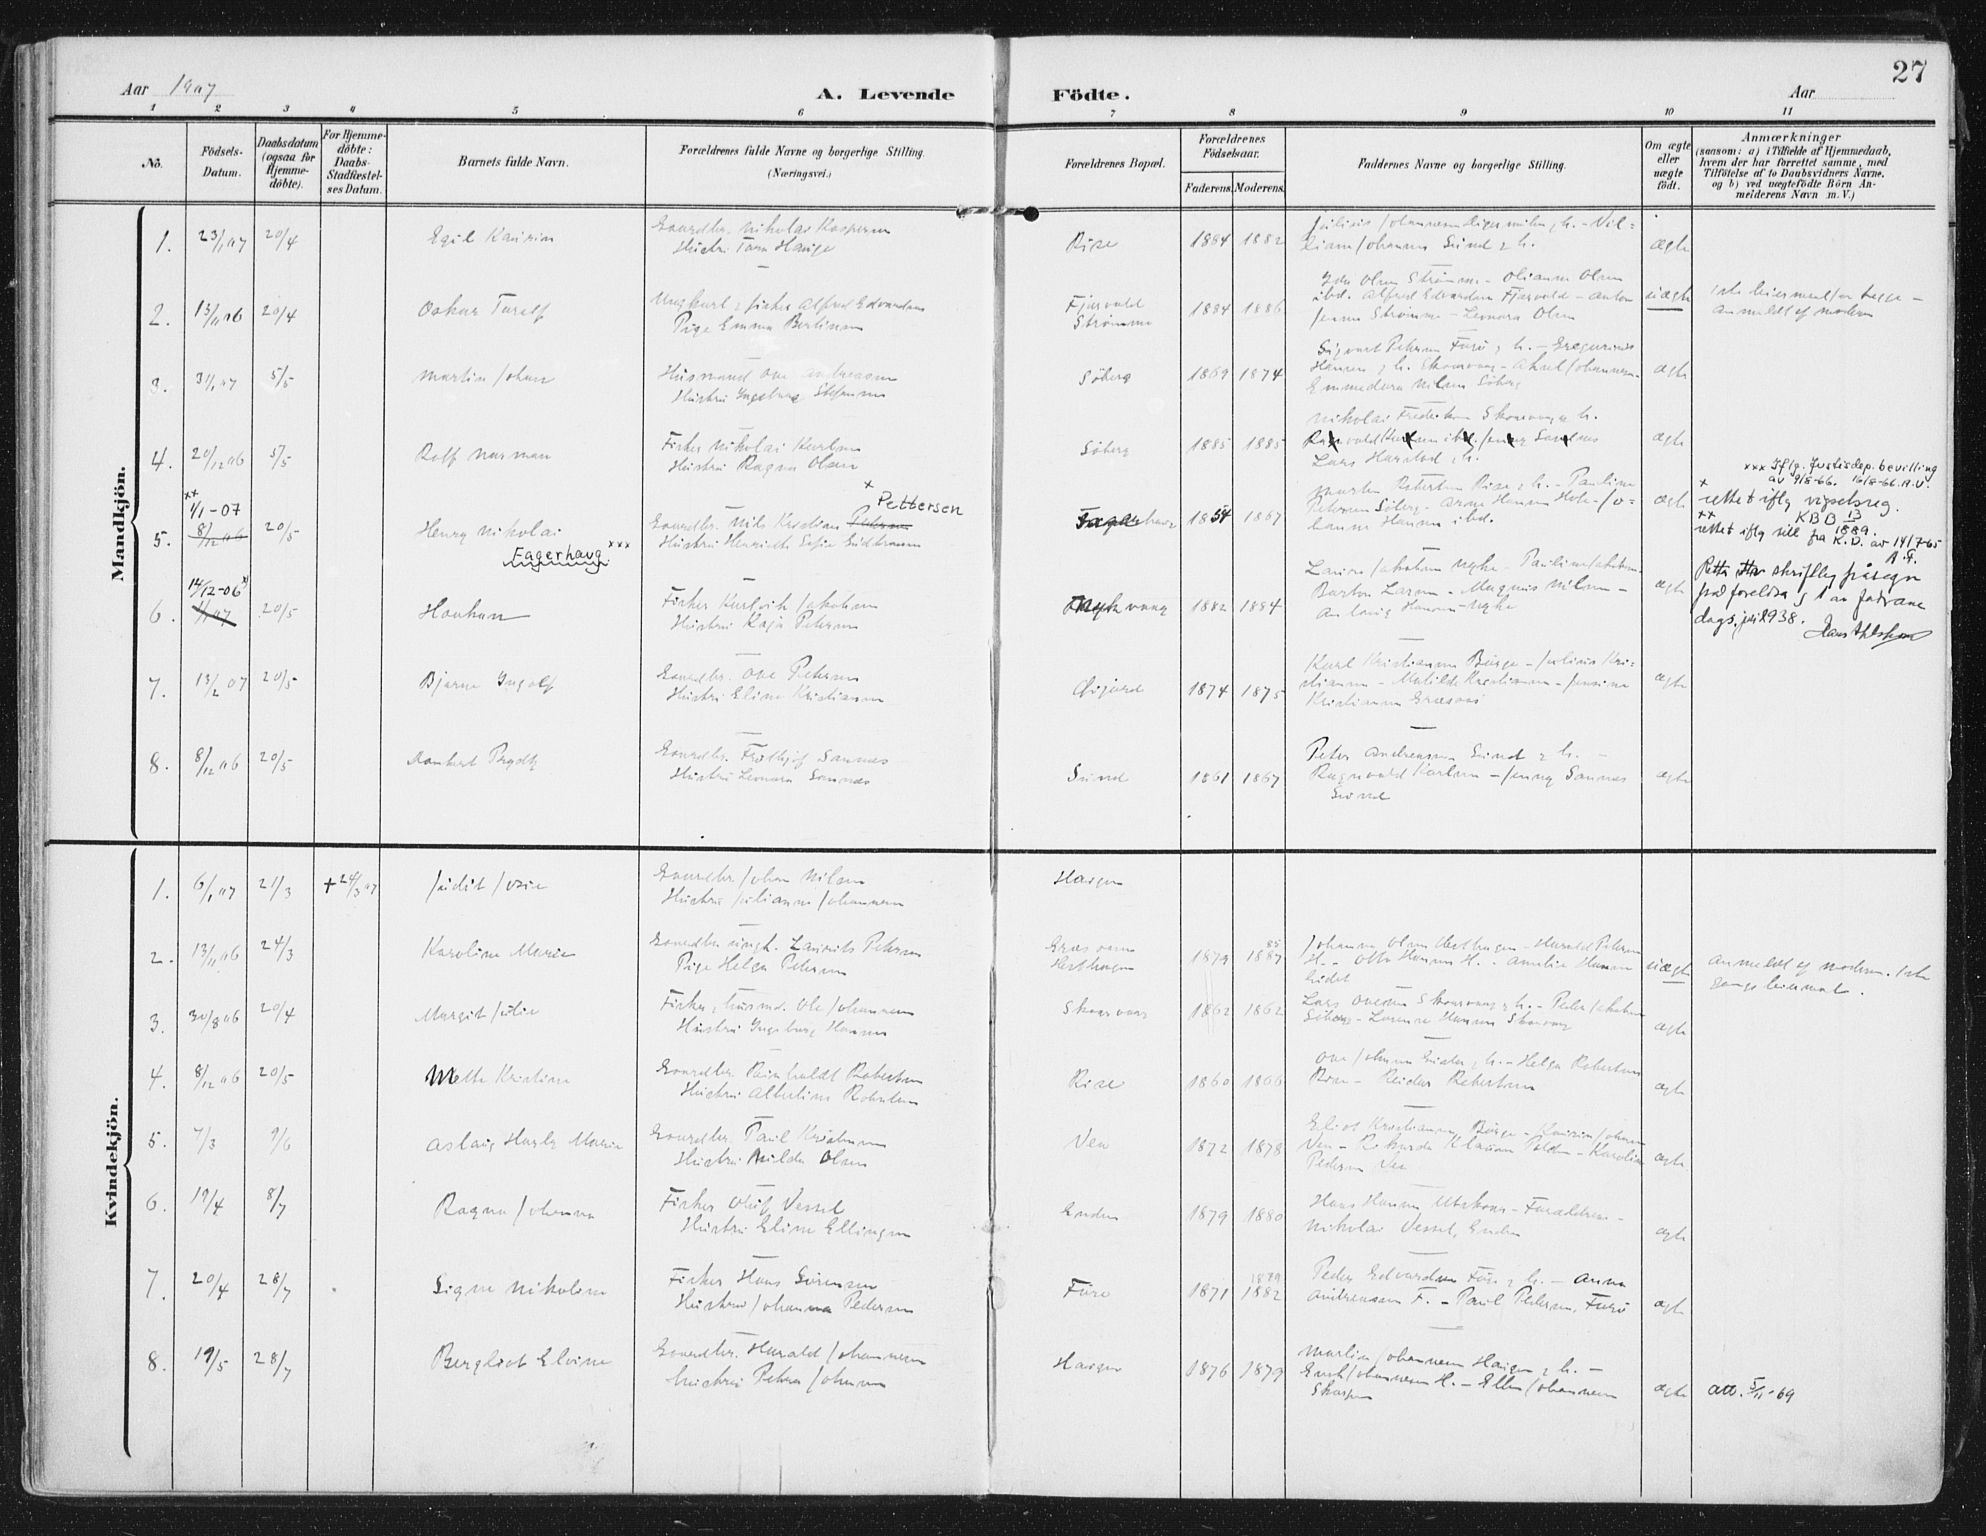 SAT, Ministerialprotokoller, klokkerbøker og fødselsregistre - Nordland, 892/L1321: Ministerialbok nr. 892A02, 1902-1918, s. 27